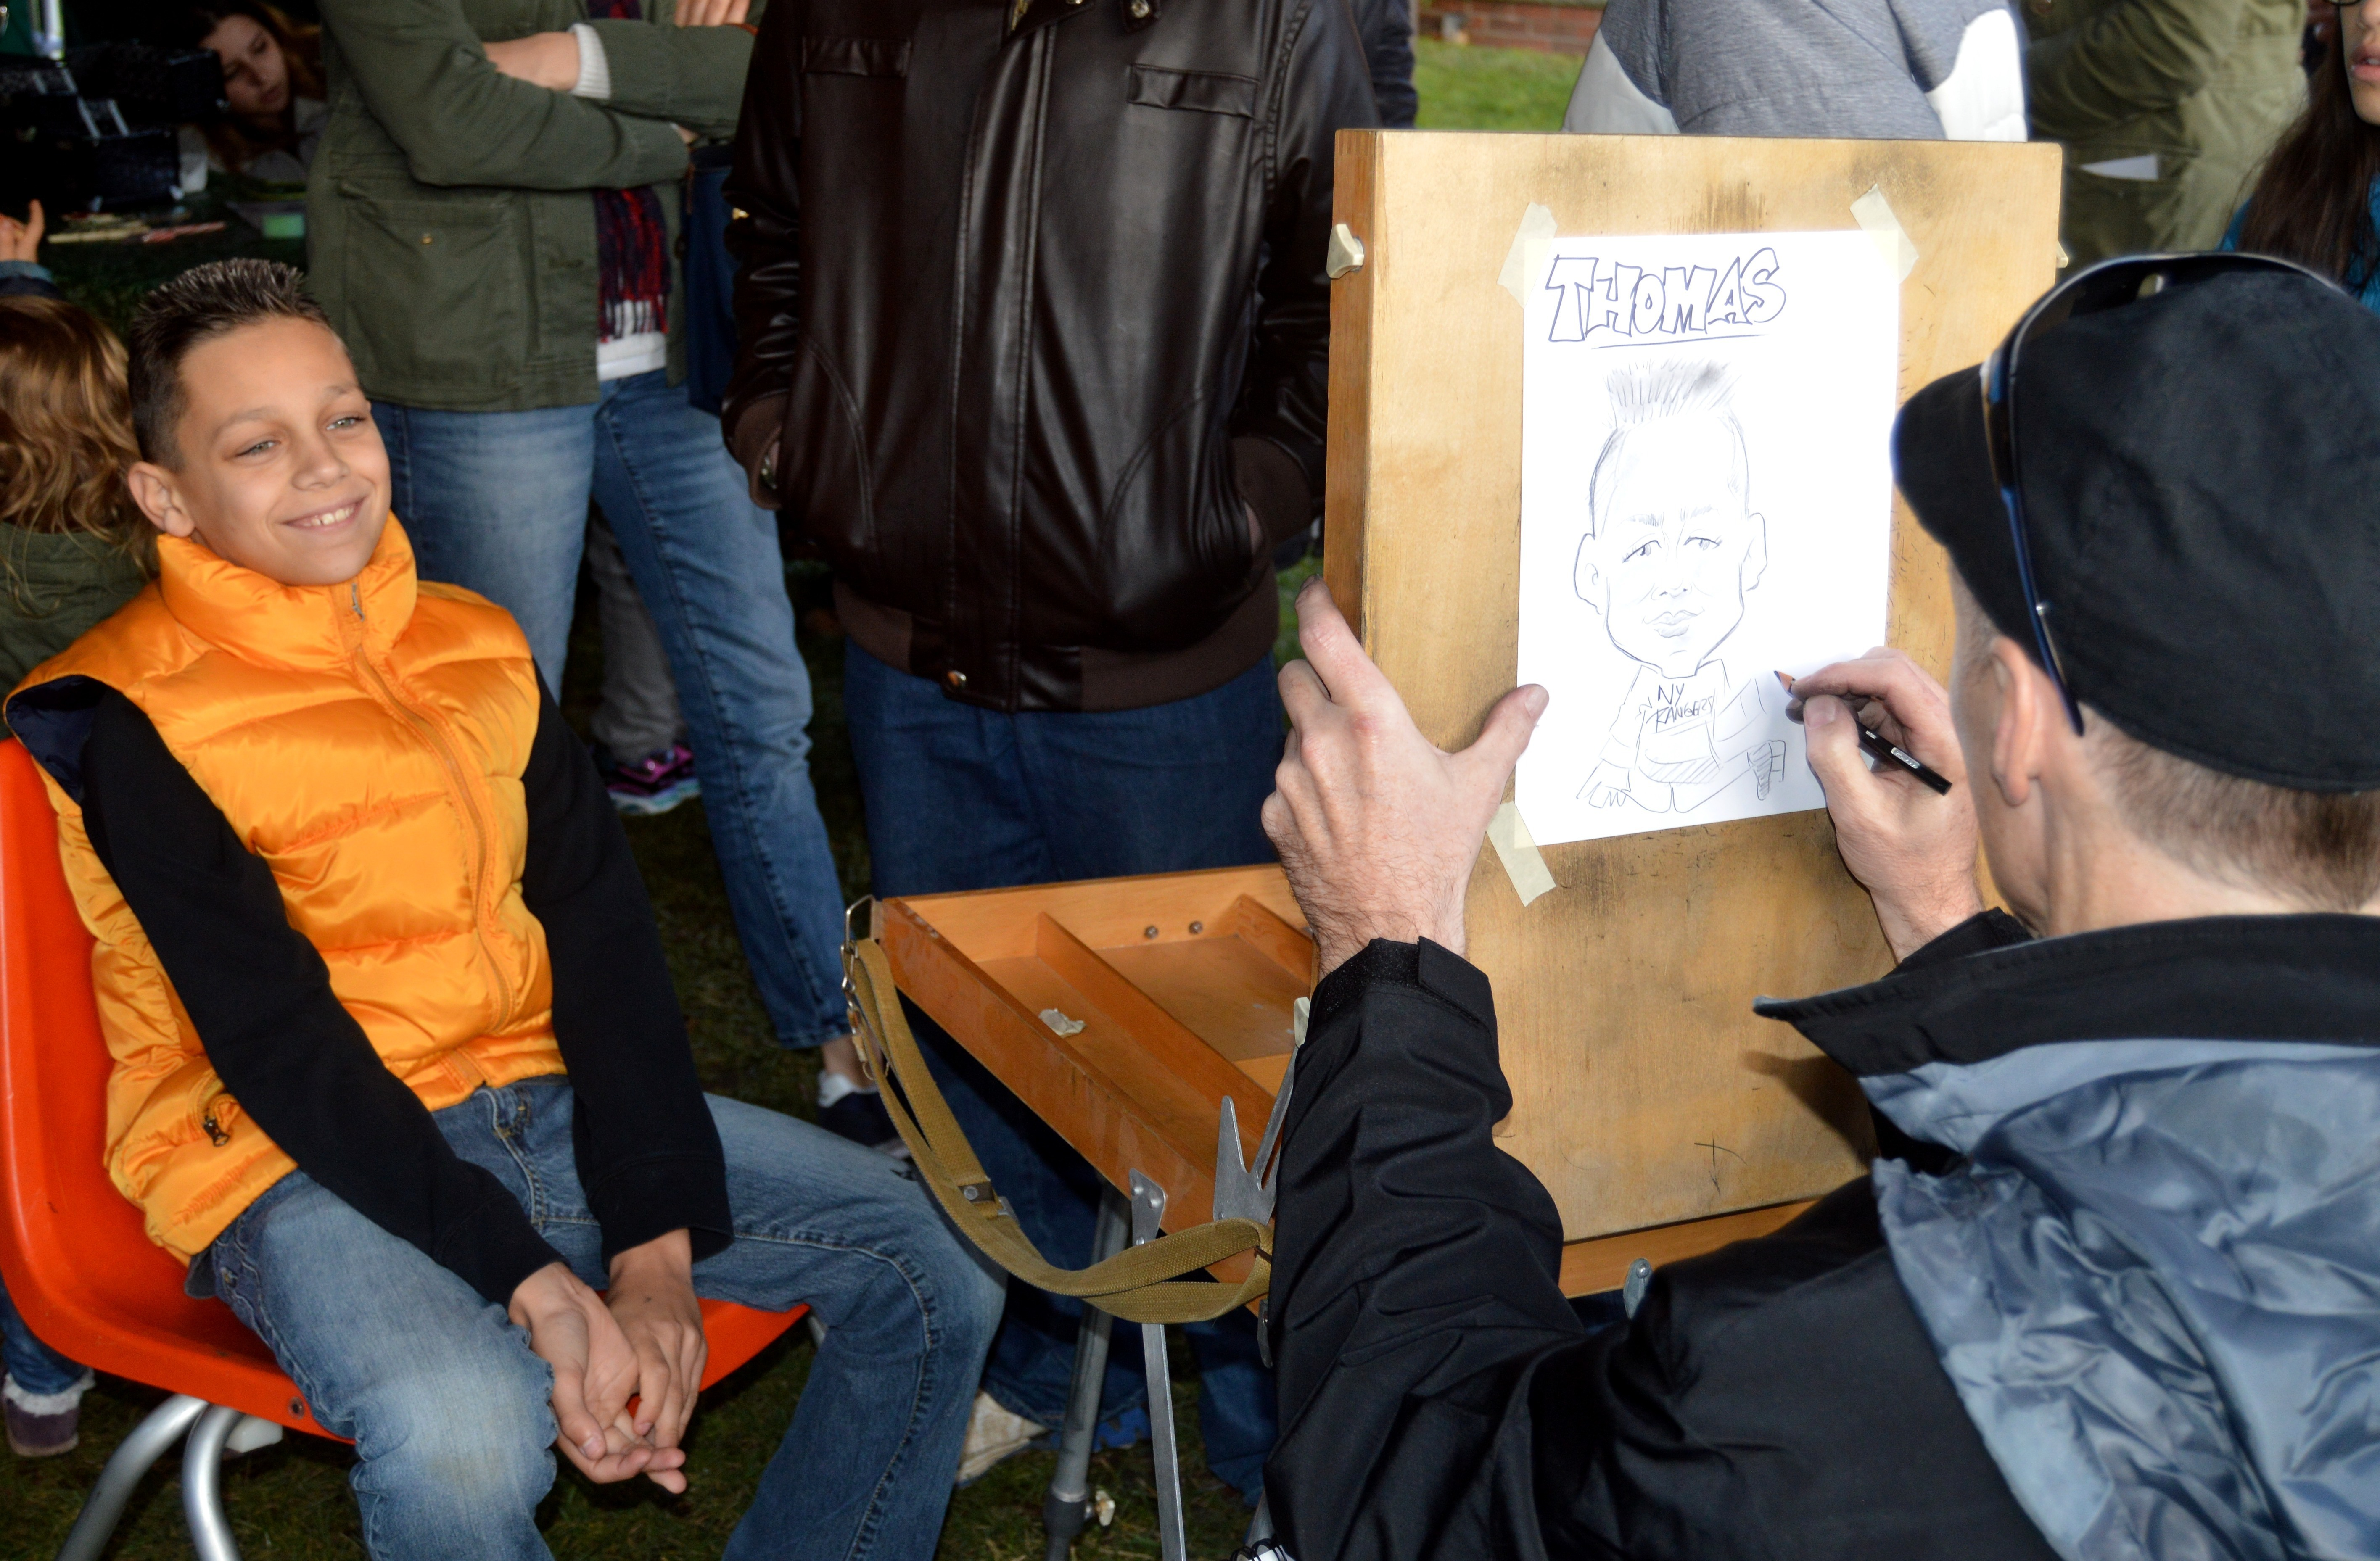 f29ffe68ff4e20f4dfd1_Thomas_DeVito_gets_his_portrait_drawn.JPG